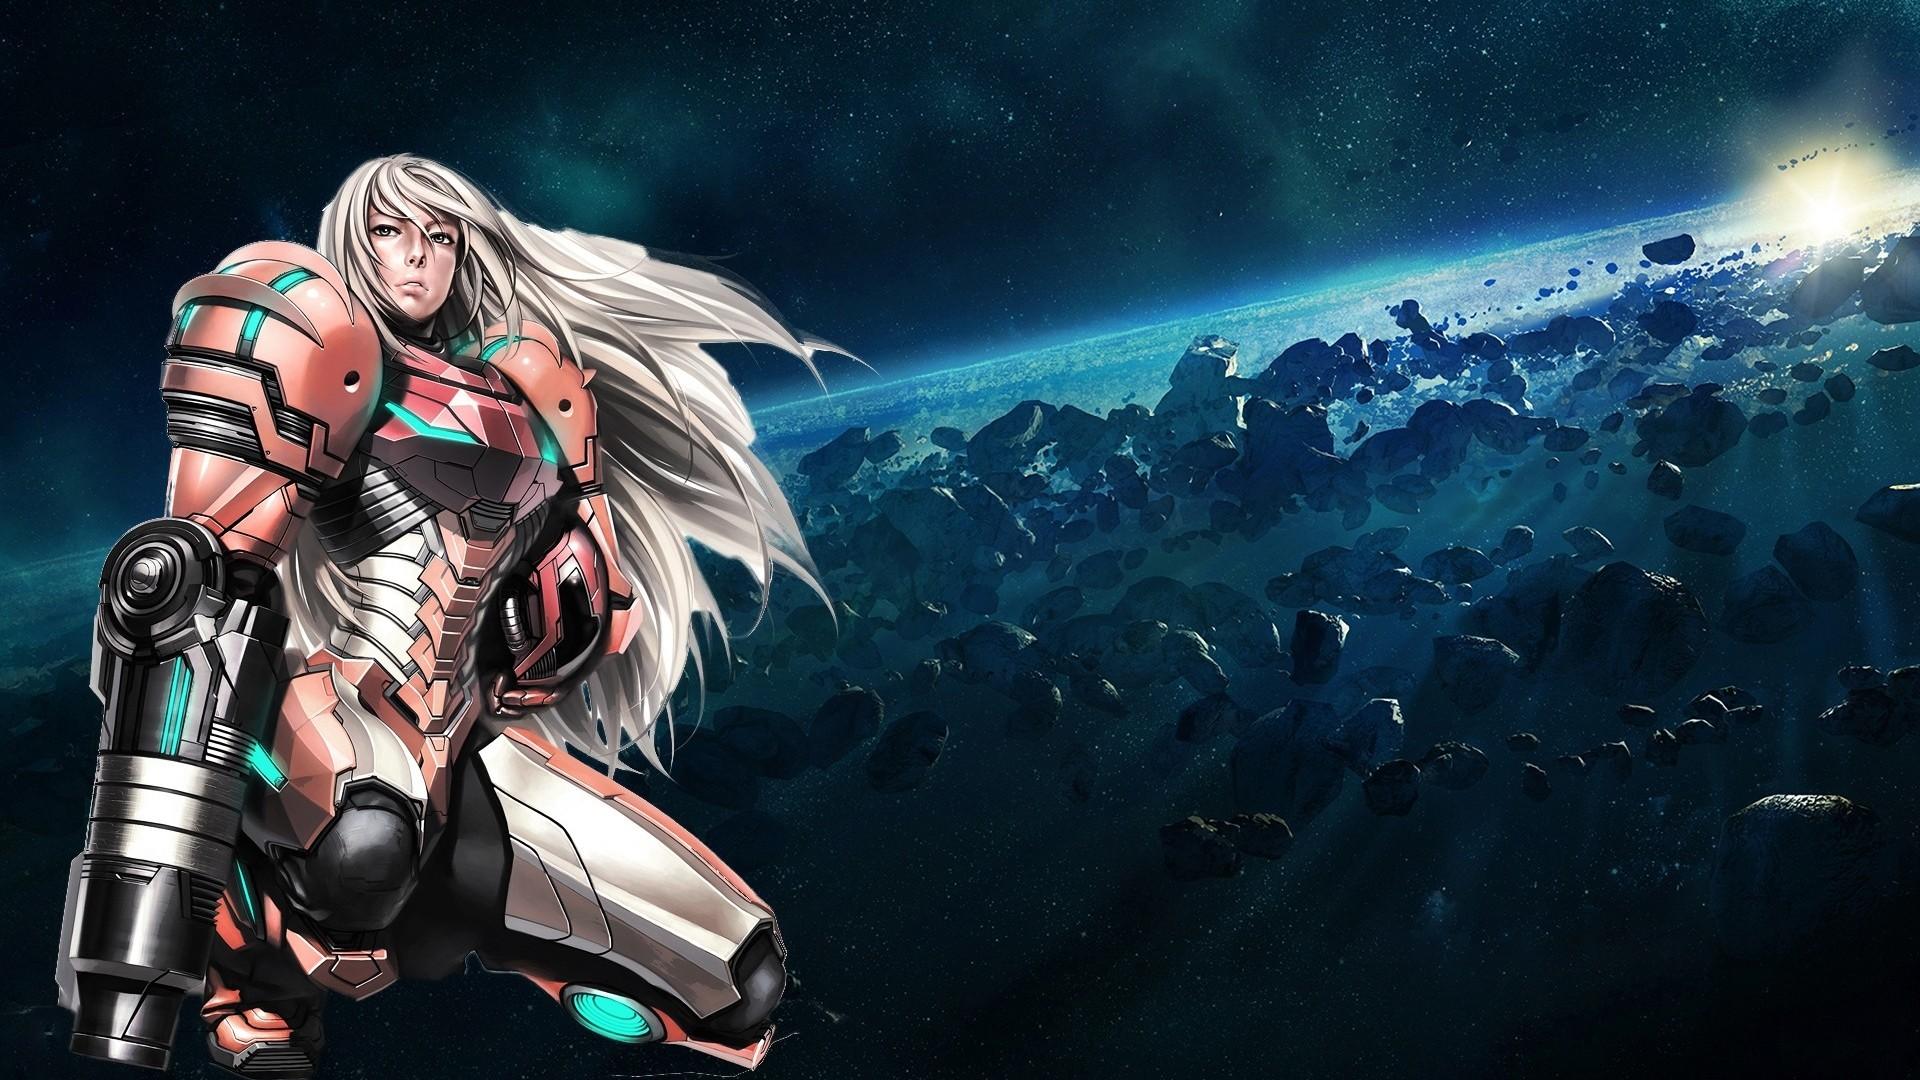 Wallpaper samus aran, metroid, girl, armor